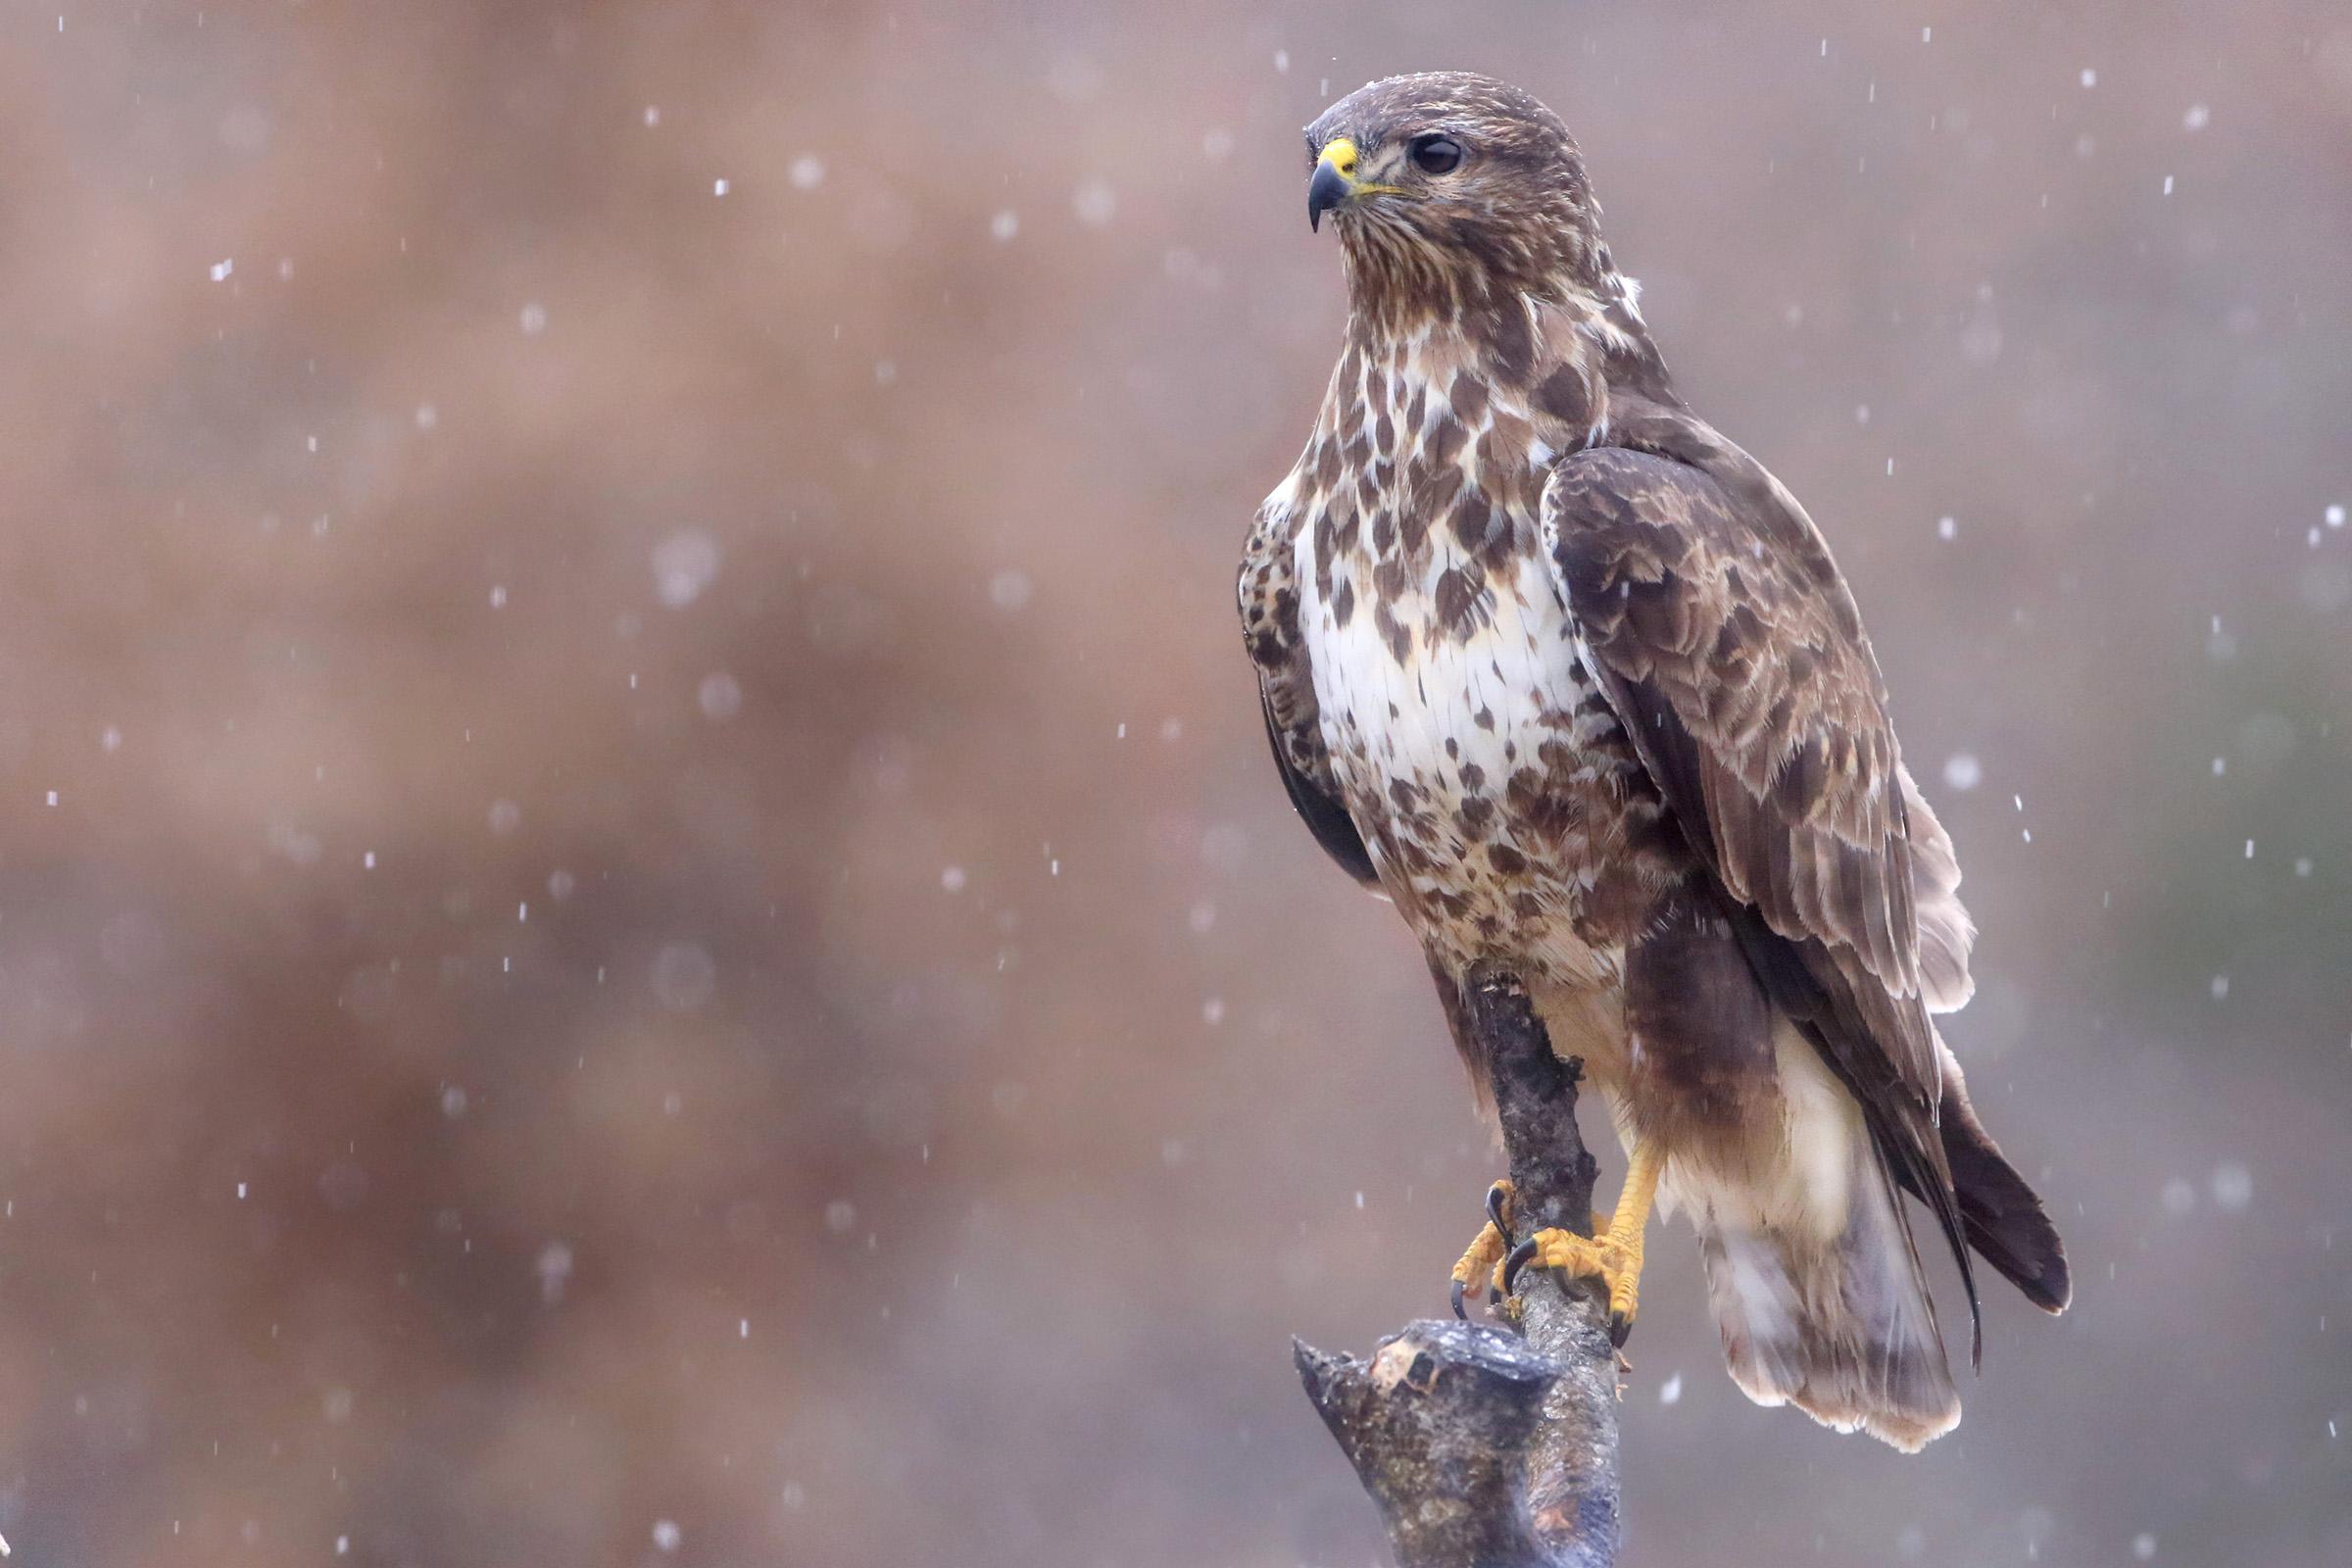 Buzzard in the snow...